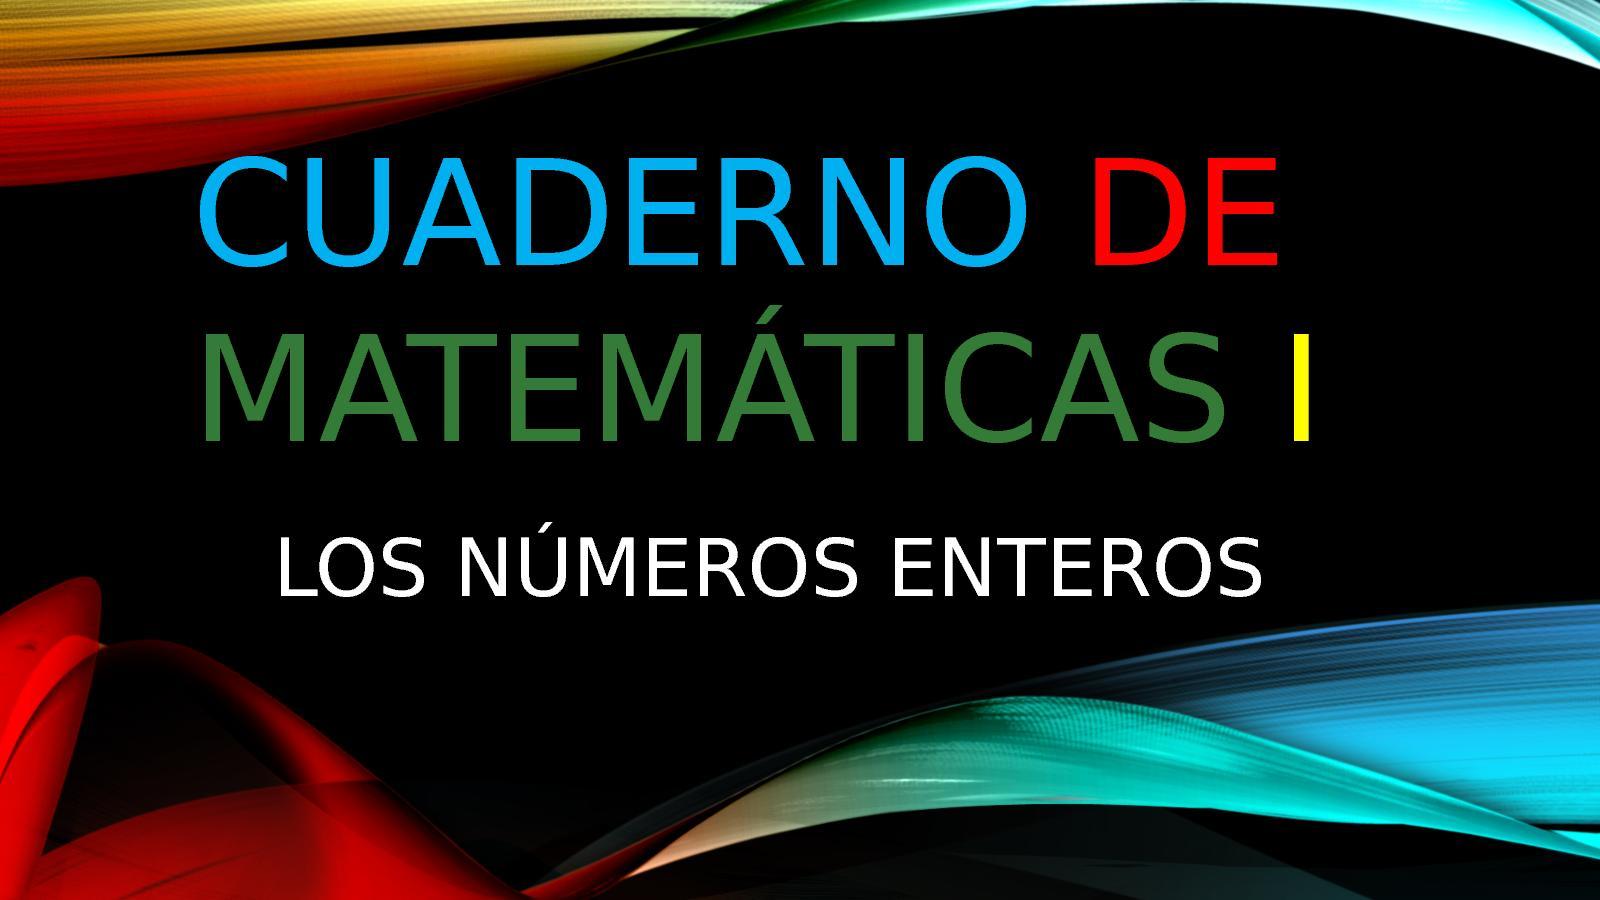 Cuaderno De Matemáticas I